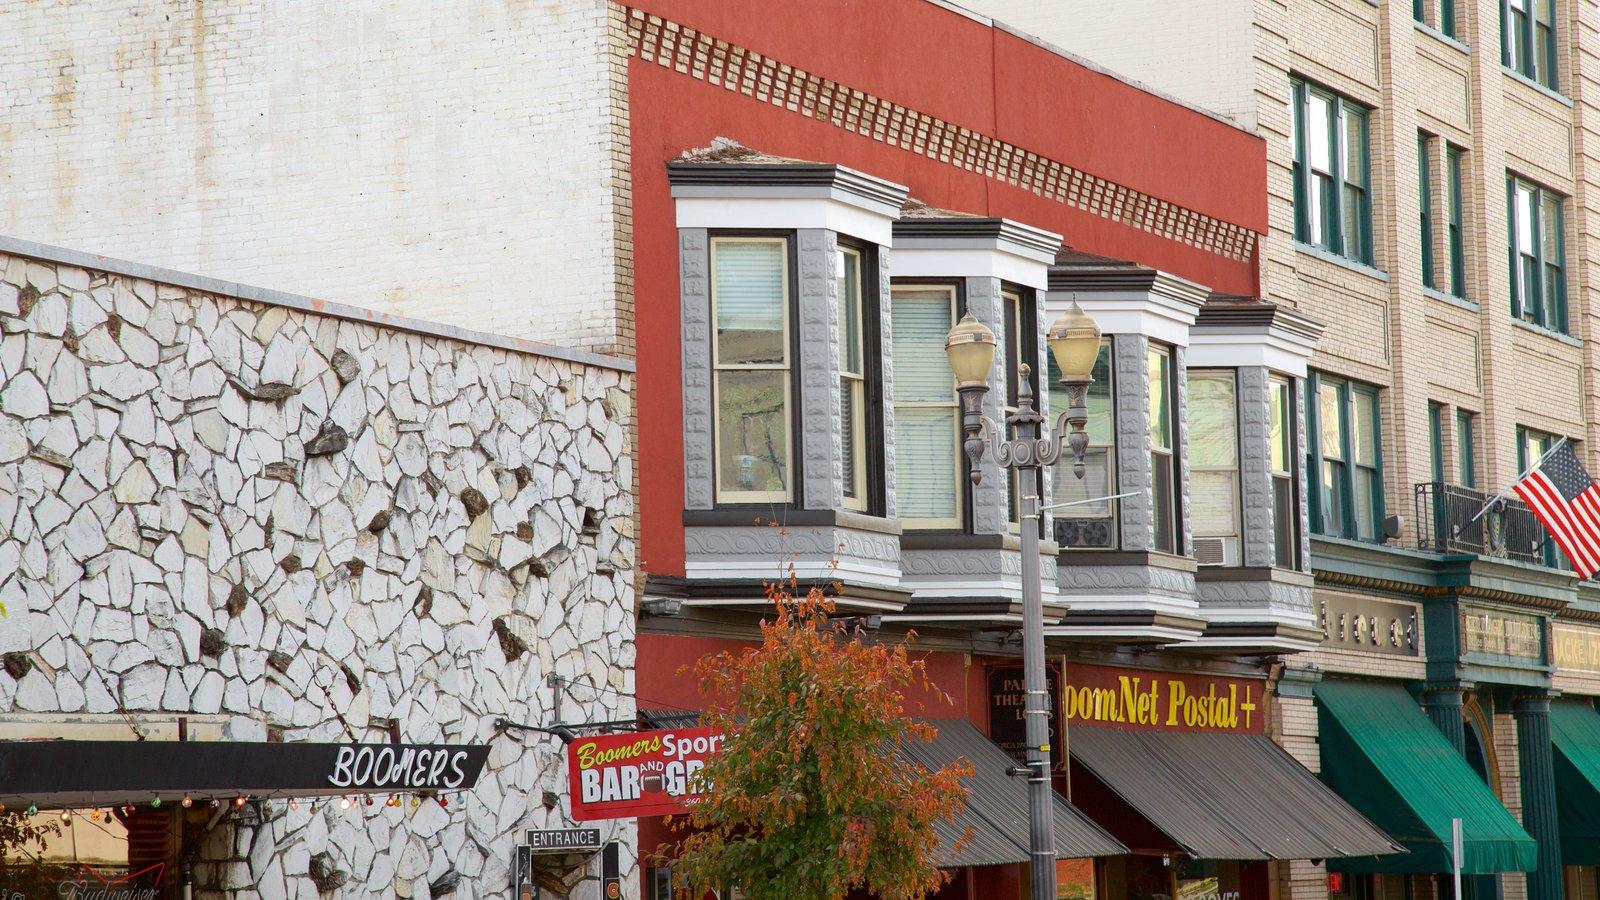 Vancouver que inclui arquitetura de patrimônio